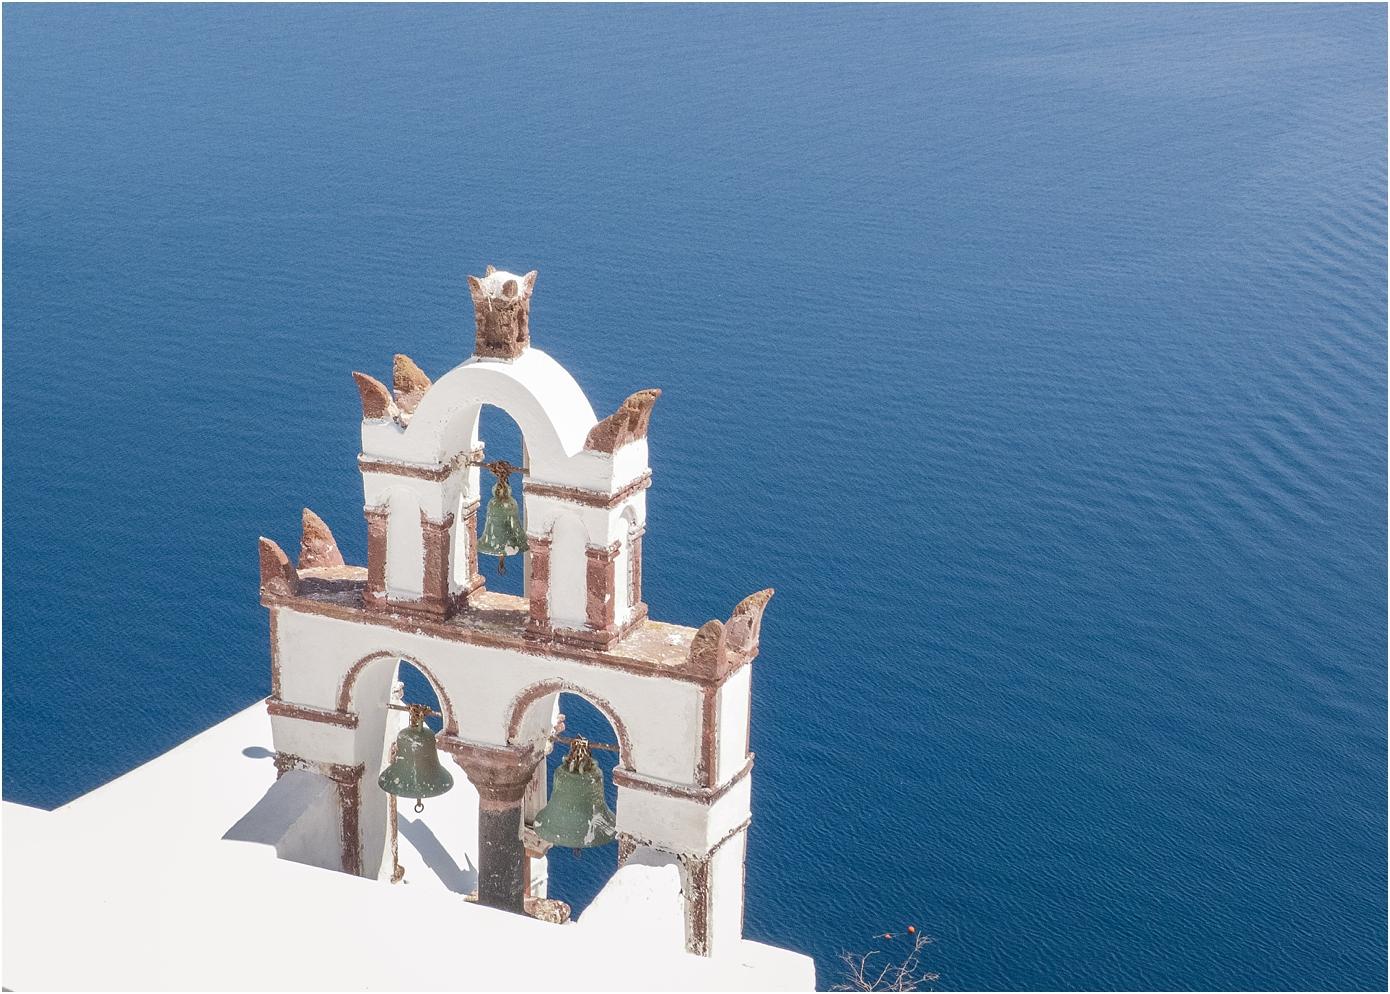 santorini-greece-wedding-photos-in-oia-destination-wedding-photographer-by-courtney-carolyn-photography_0013.jpg